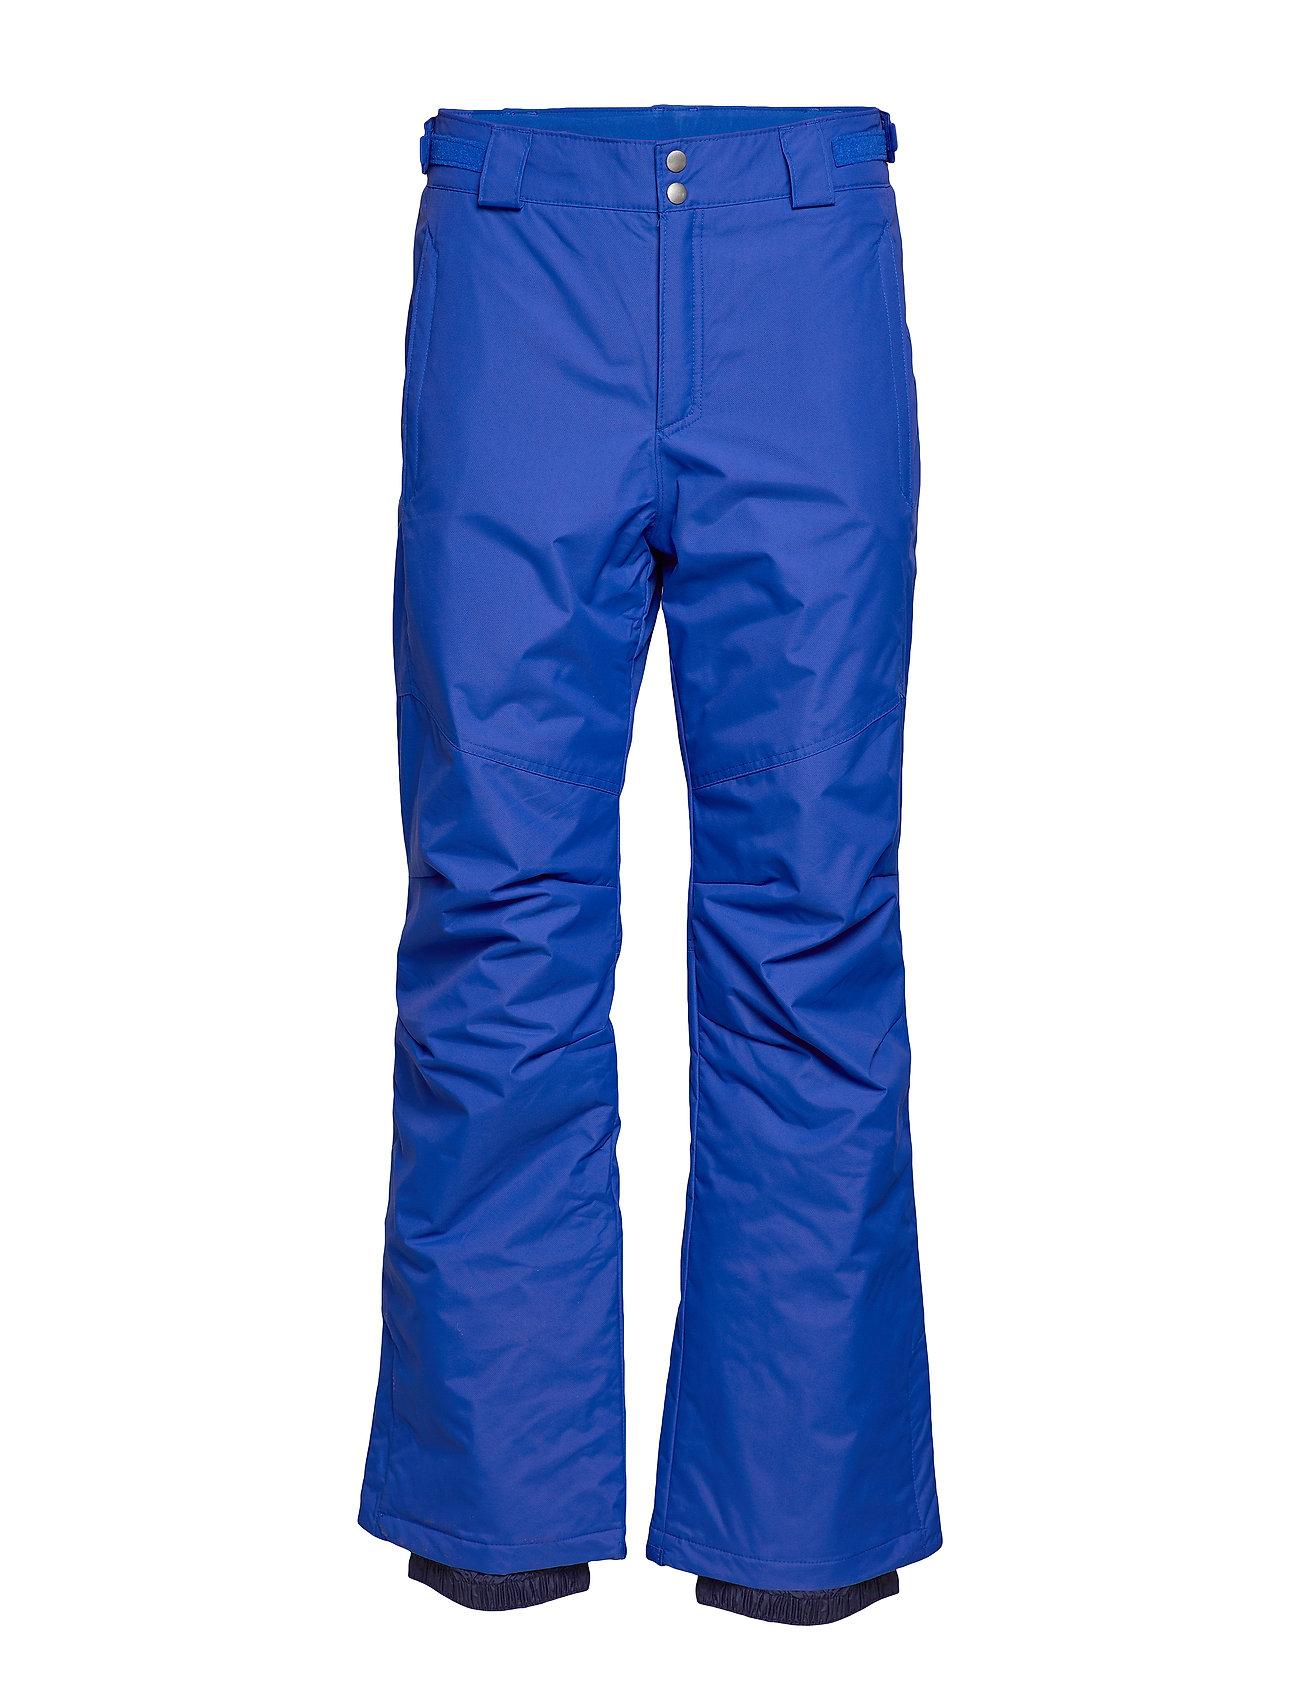 Image of Bugaboo Iv Pant Sport Pants Blå Columbia (3245420597)